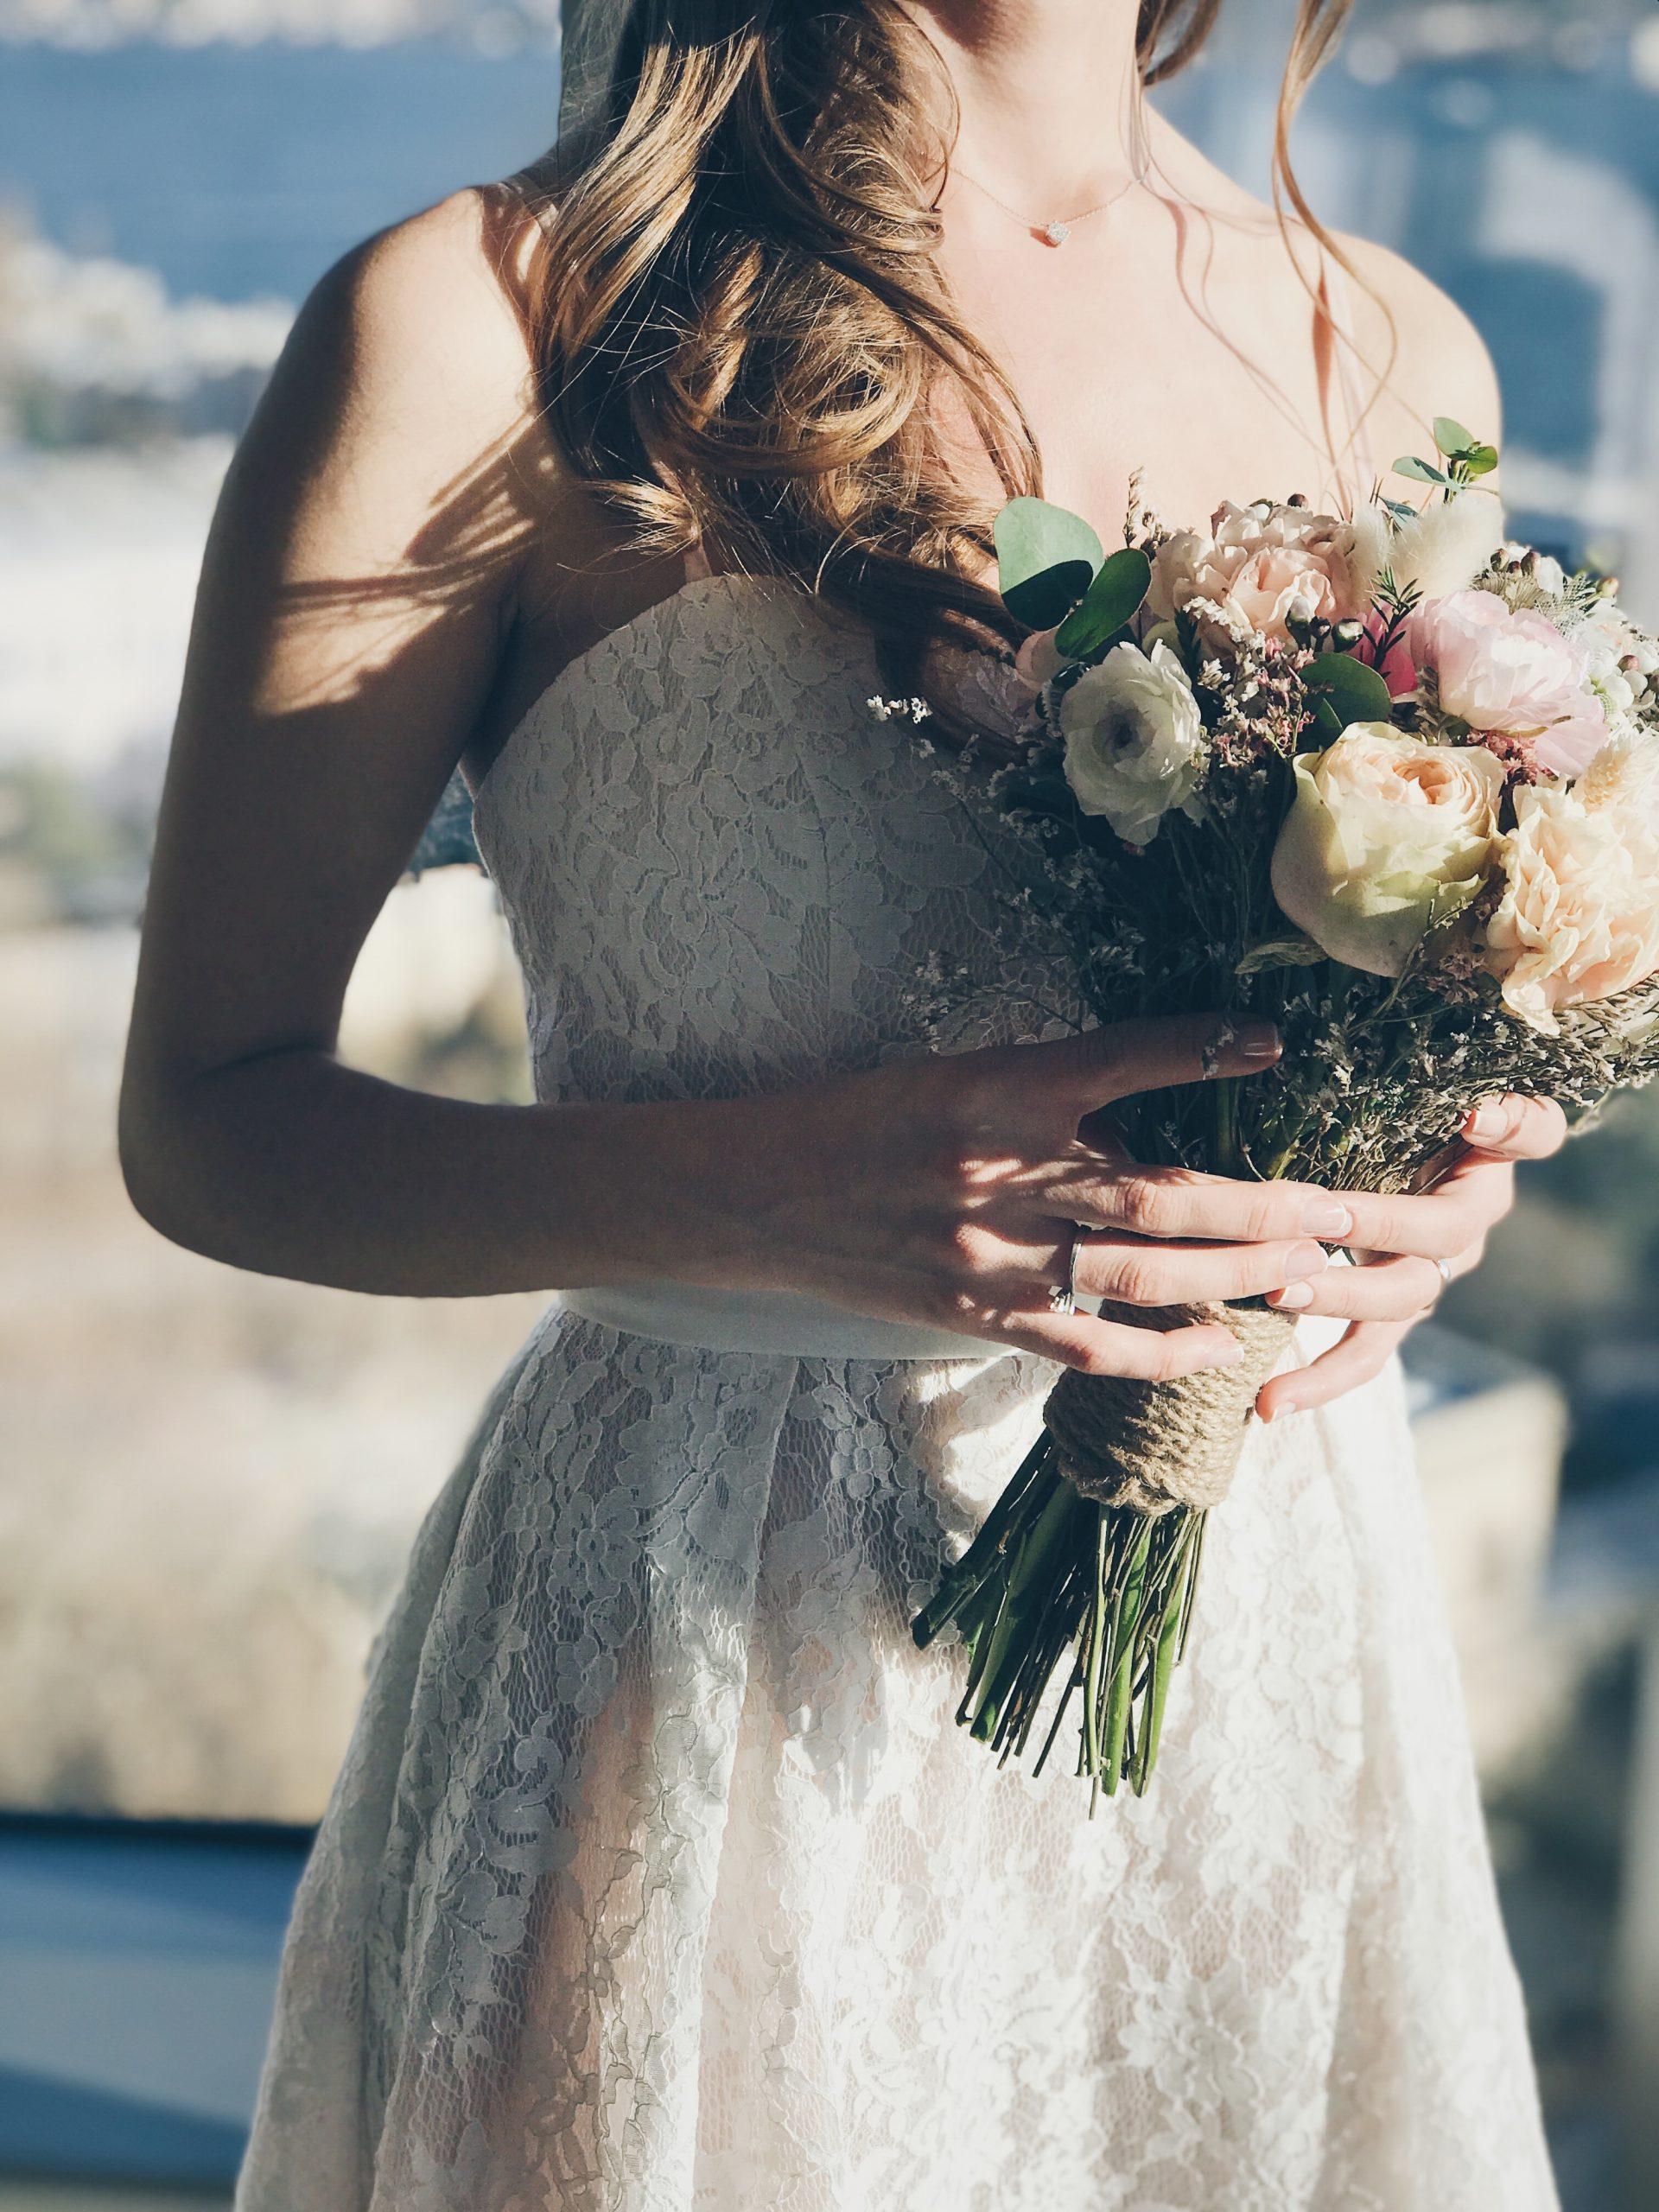 What should happen at a wedding reception?